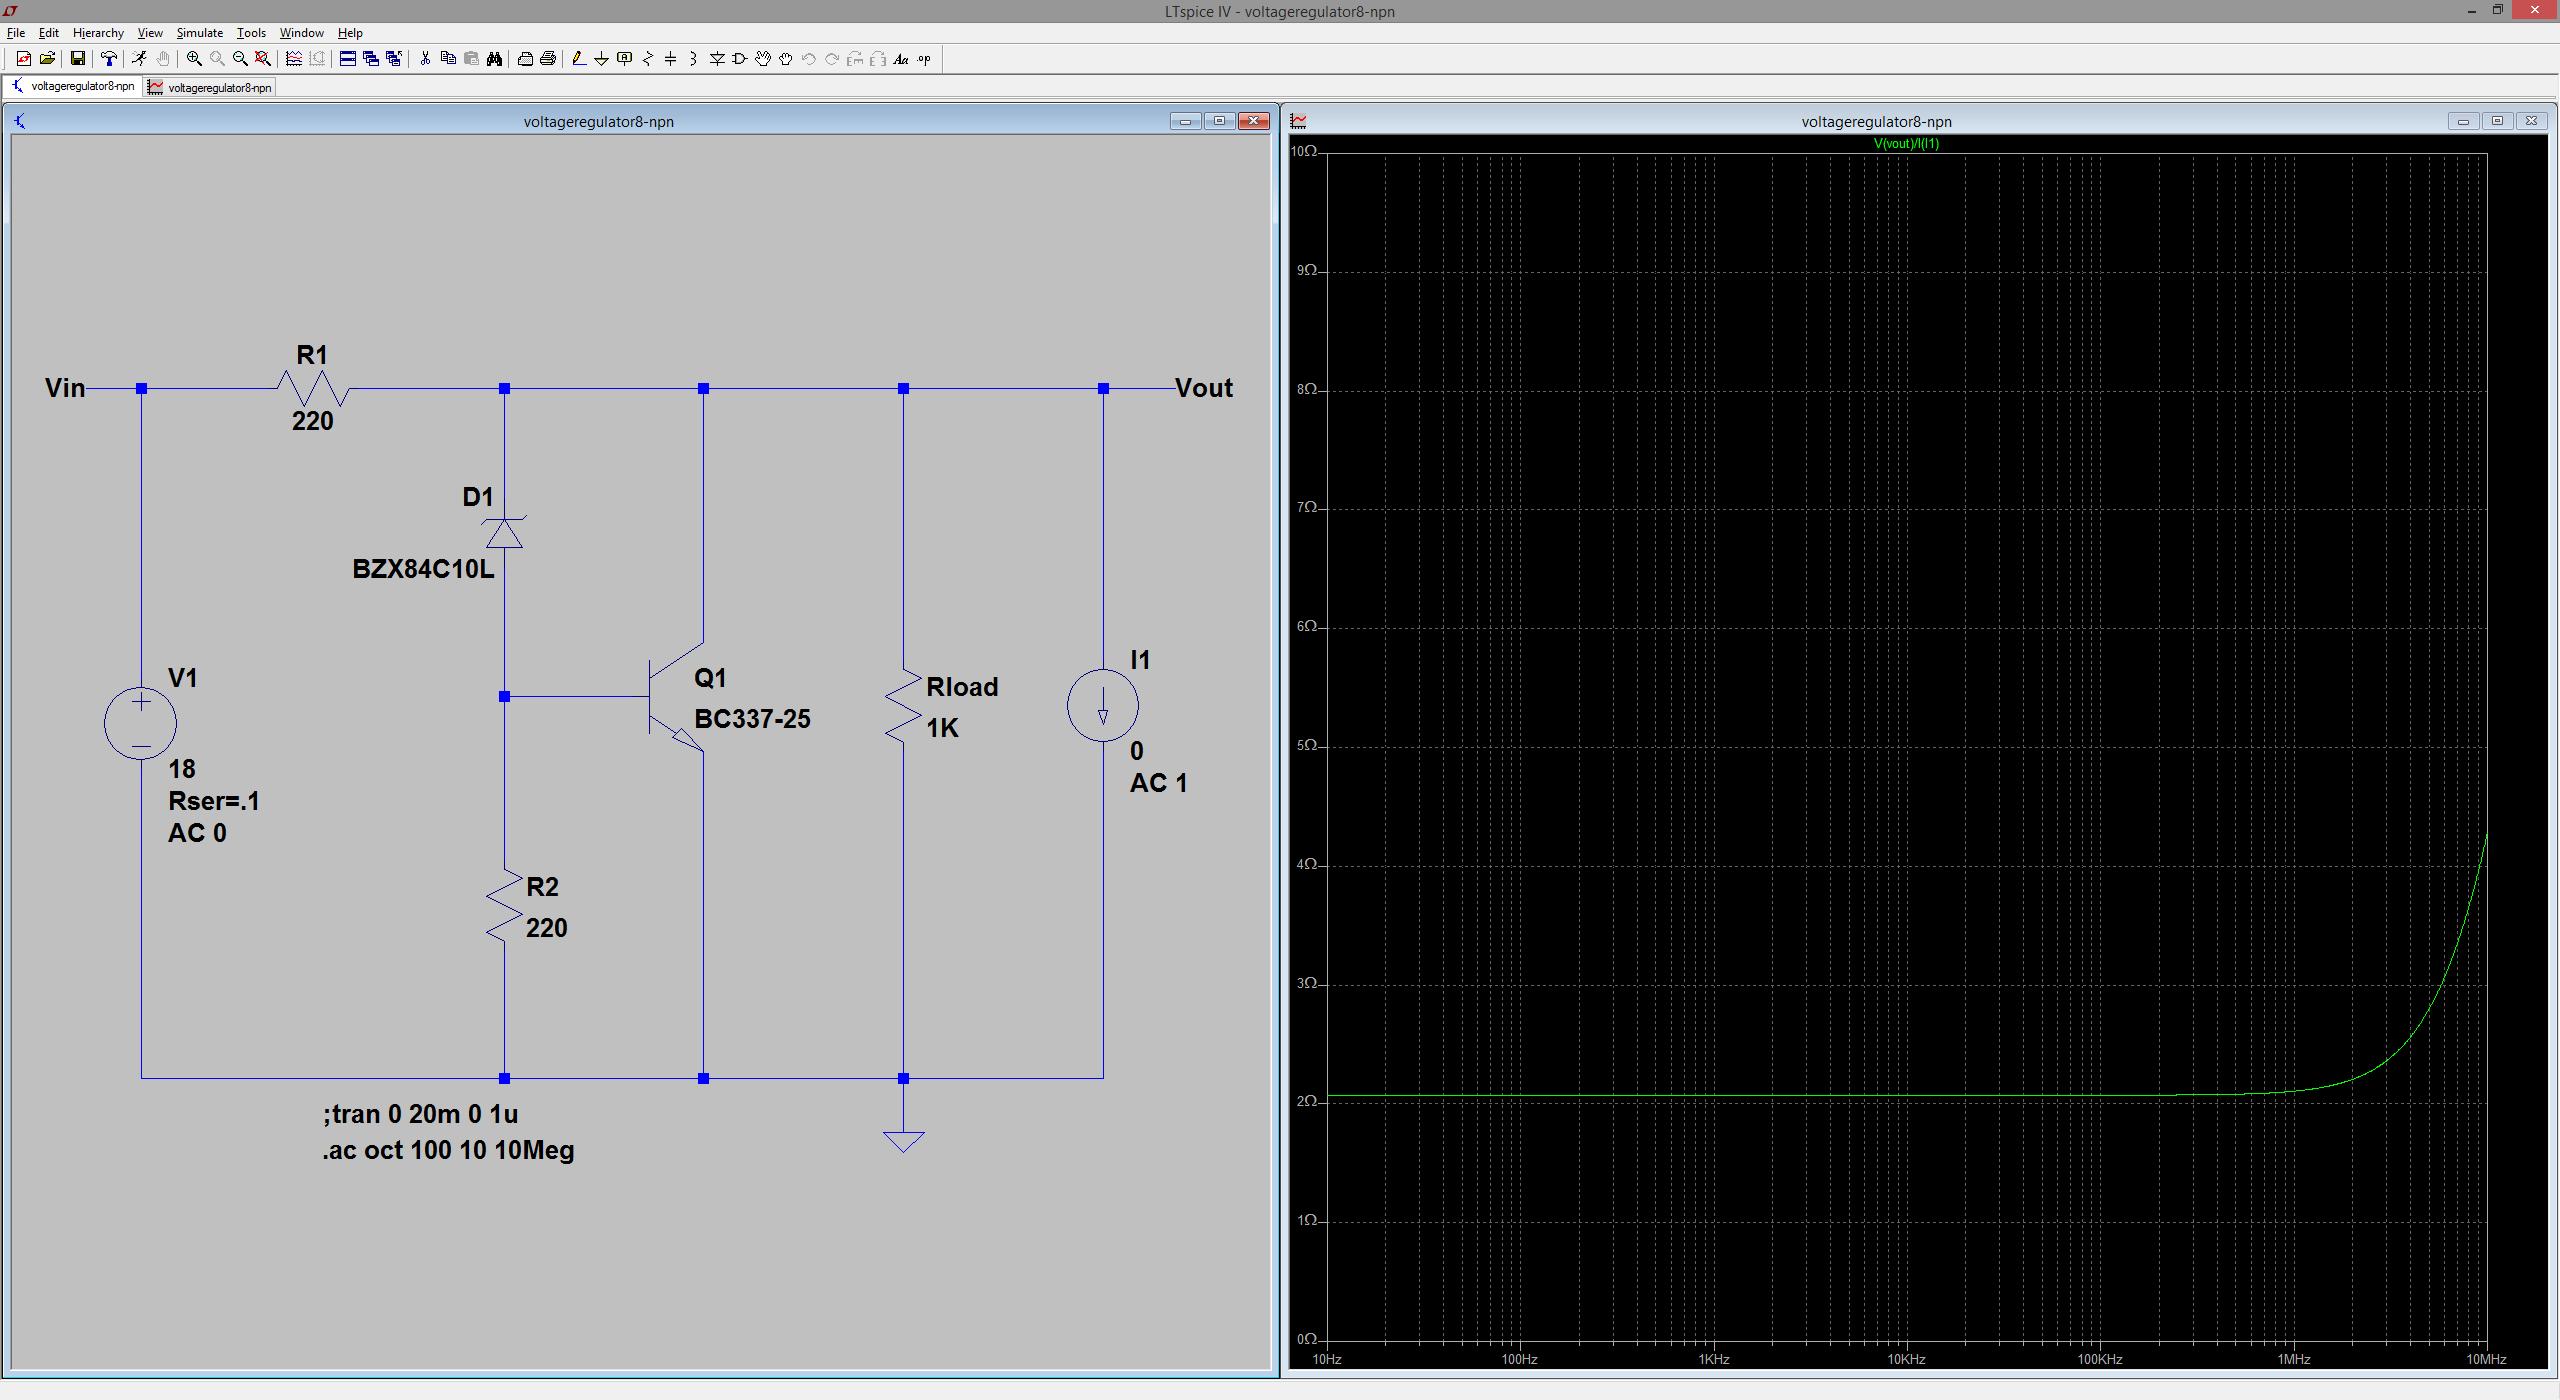 Voltage Regulators For Line Level Audio Part 10 Simple Shunts Current Source With Lm317